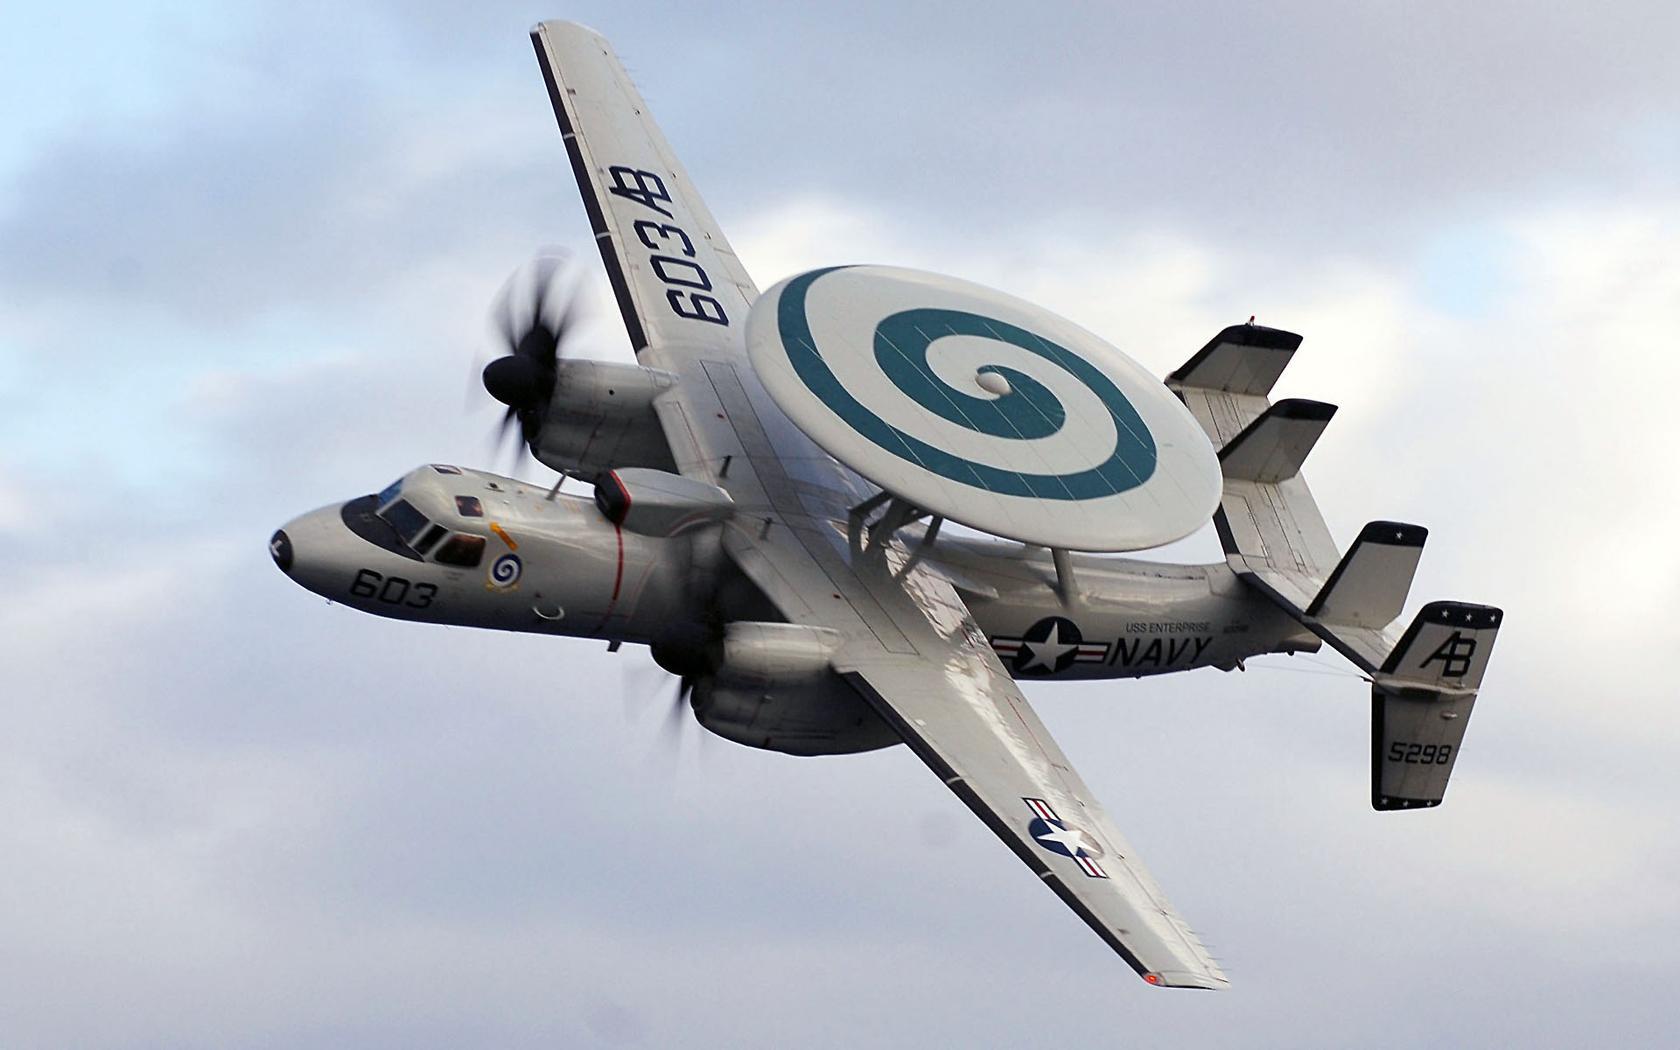 Download Wallpaper 1680x1050 Northrop Grumman E-2 Hawkeye Airplane